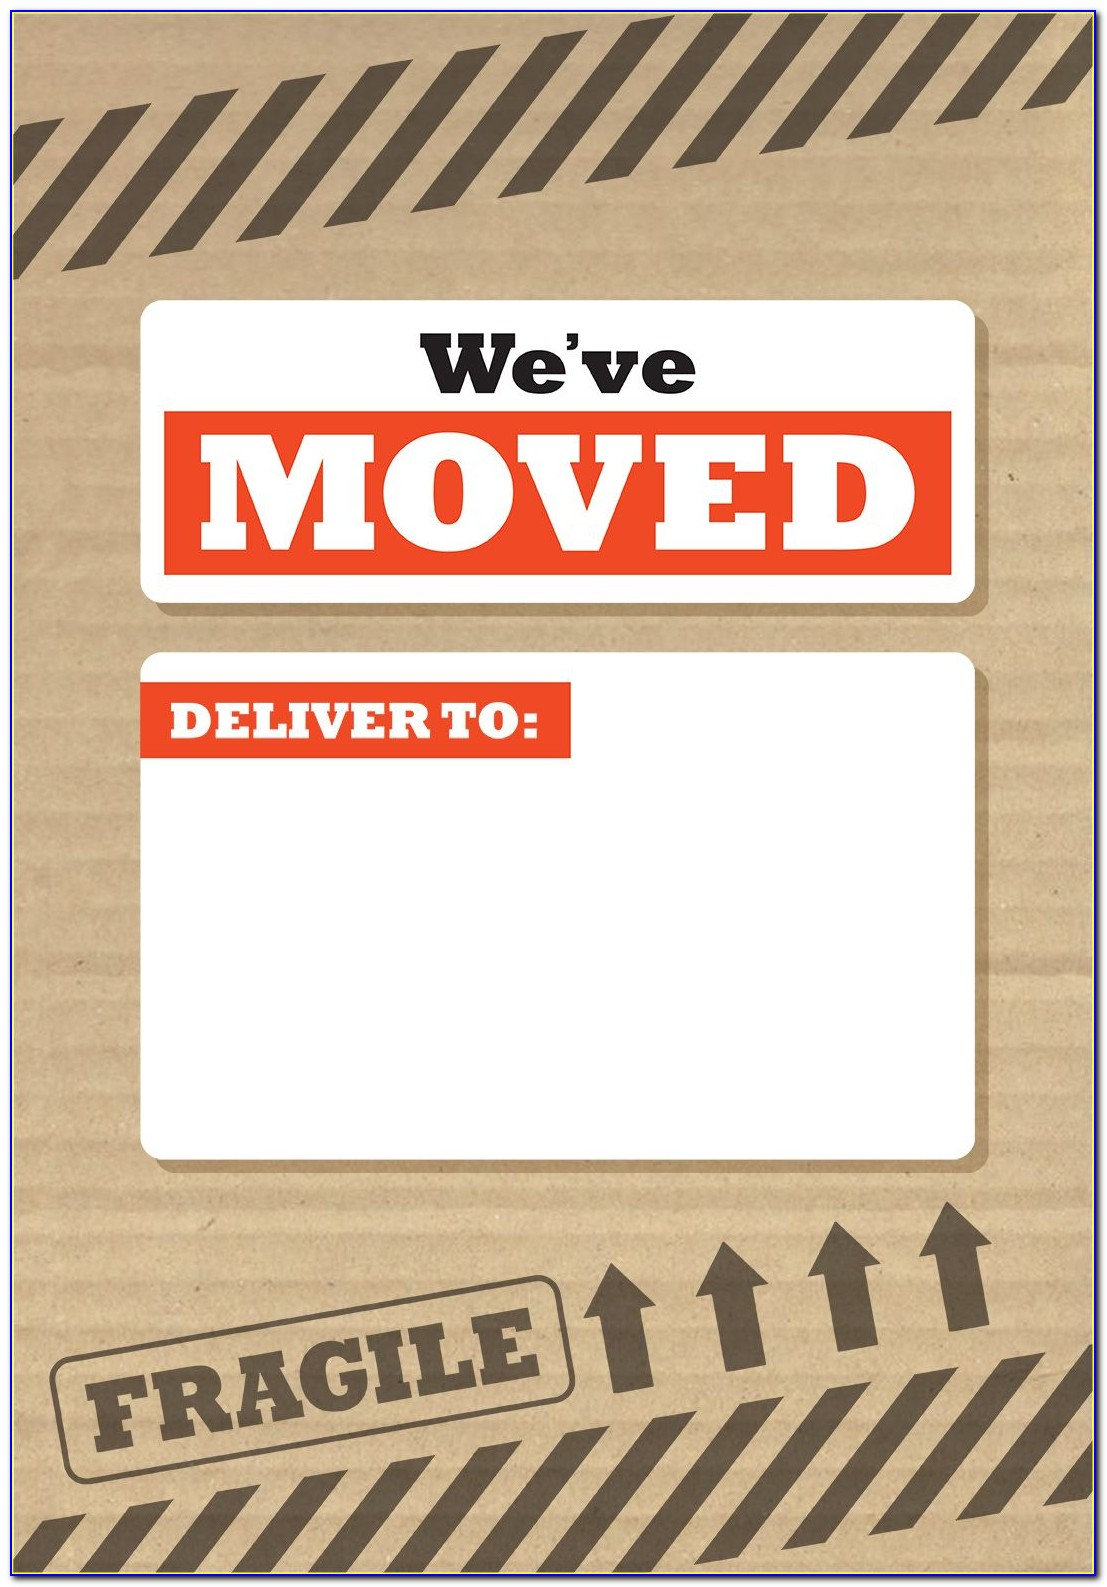 Business Relocation Announcement Letter